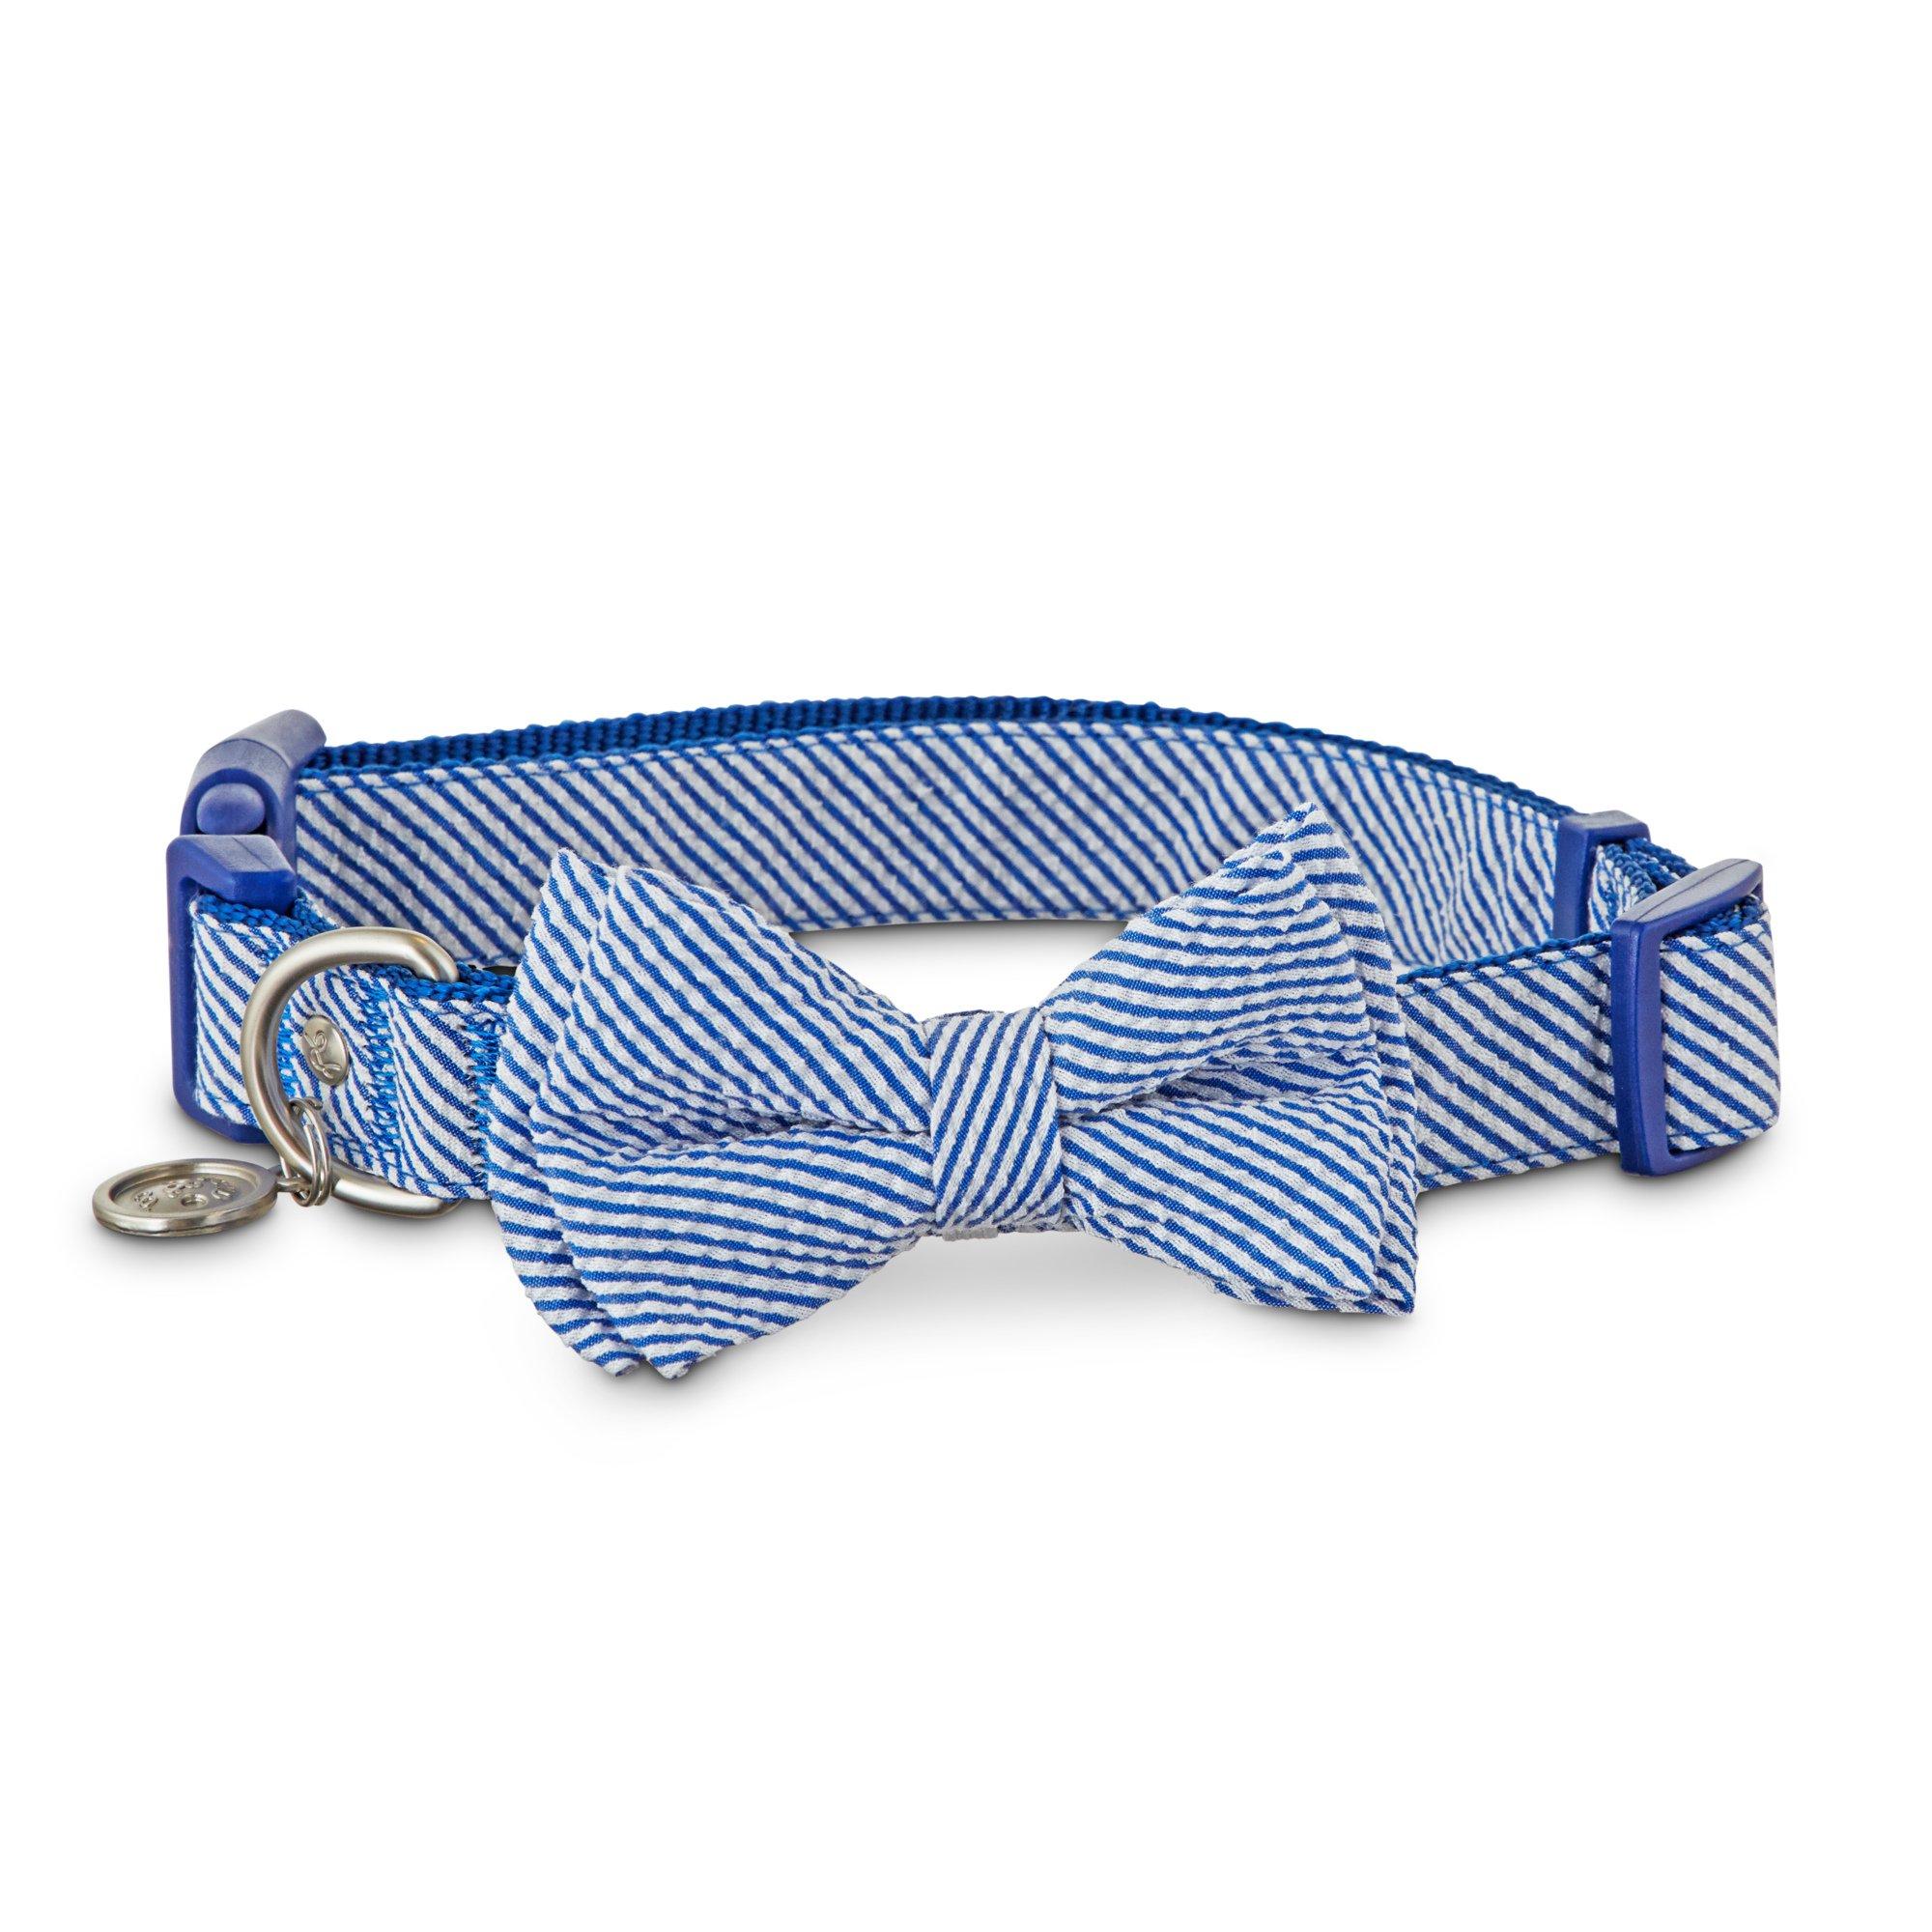 Bond & Co. Navy Seersucker Bow Tie Dog Collar | Petco at Petco in Braselton, GA | Tuggl